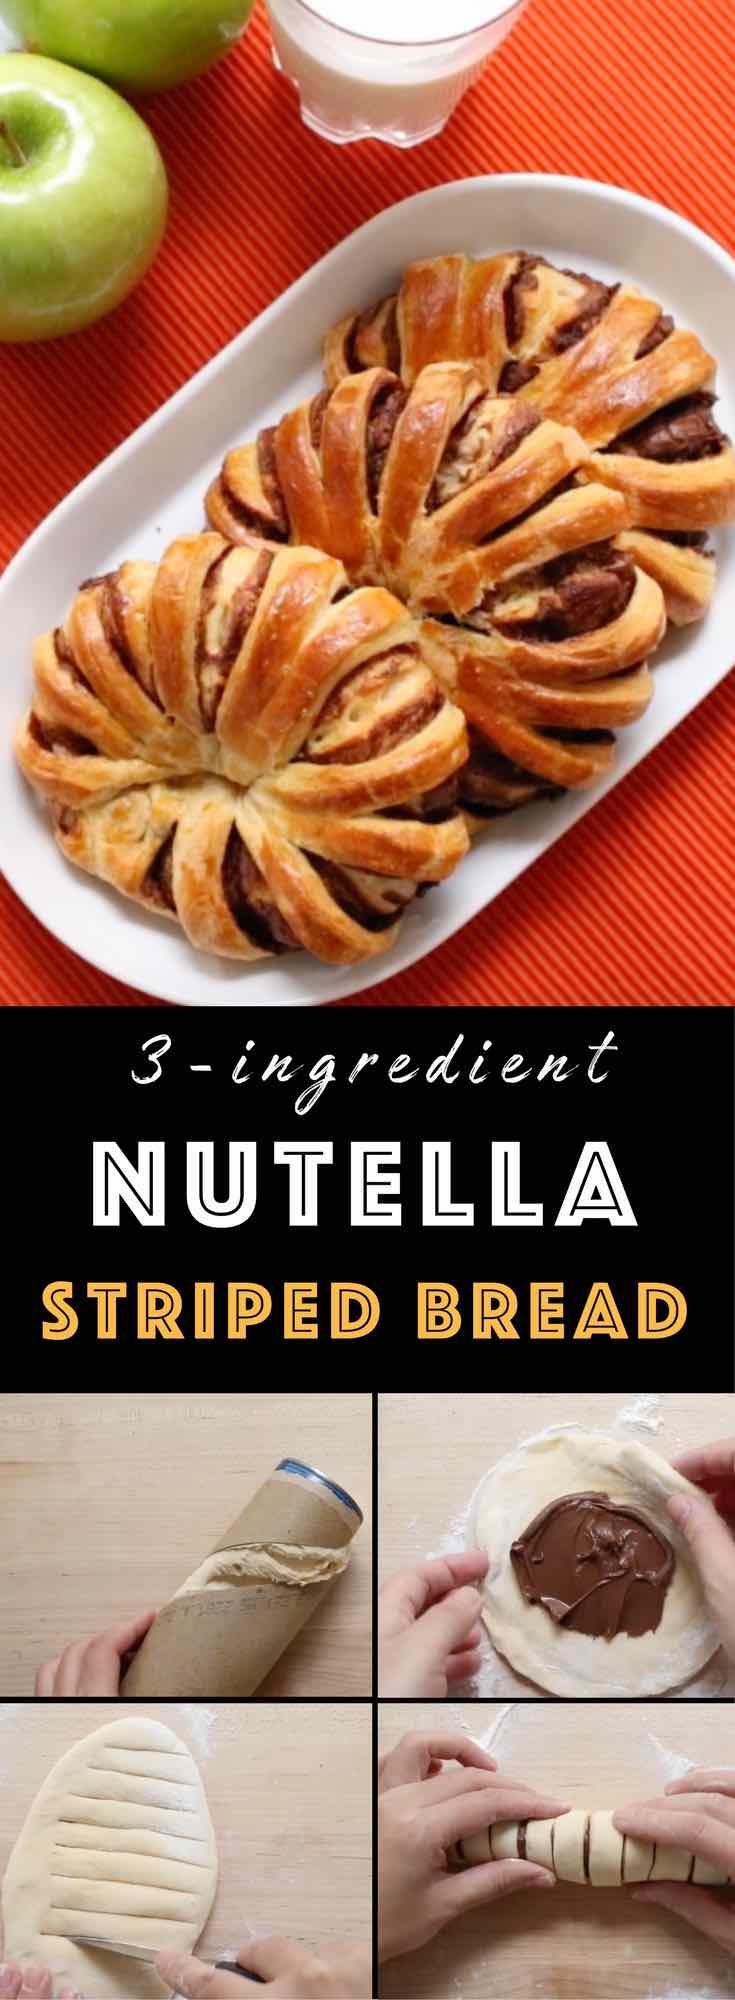 Braided Nutella Bread - TipBuzz